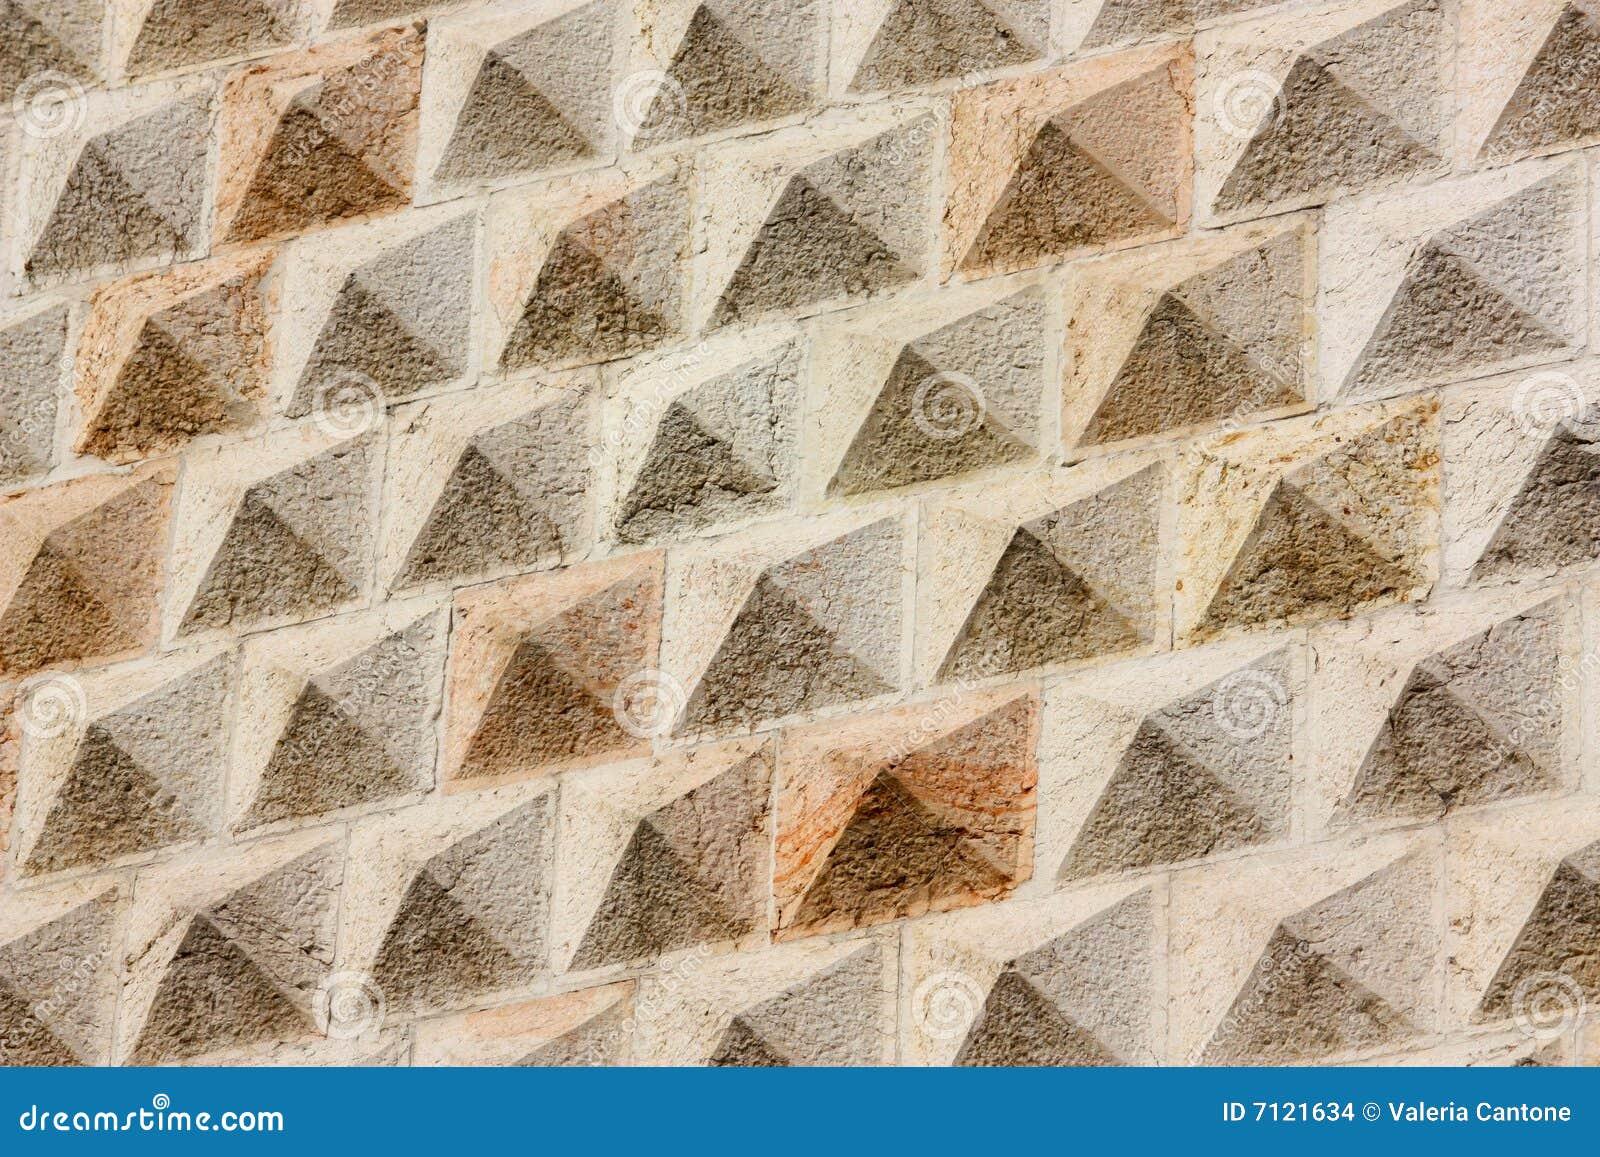 Diamonds palace detail ferrara italy stock images - Palais de diamant ...